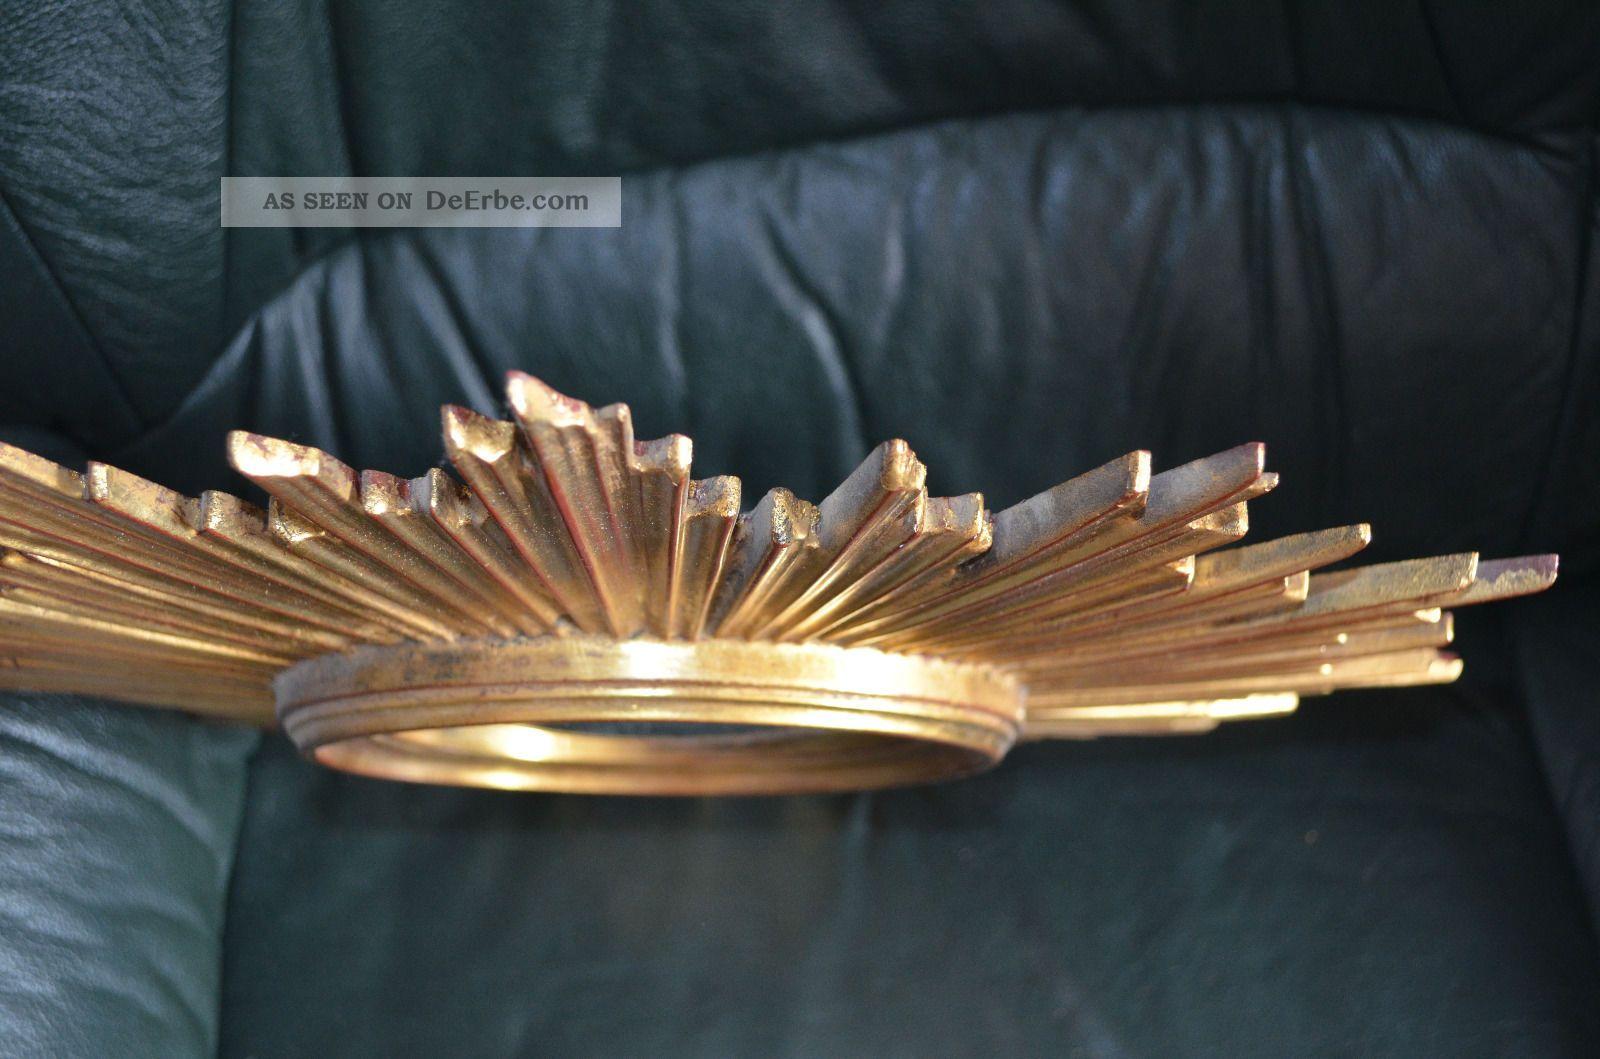 barock antik wandspiegel spiegel sonne runder spiegel in gold ca 45 x 45 cm. Black Bedroom Furniture Sets. Home Design Ideas